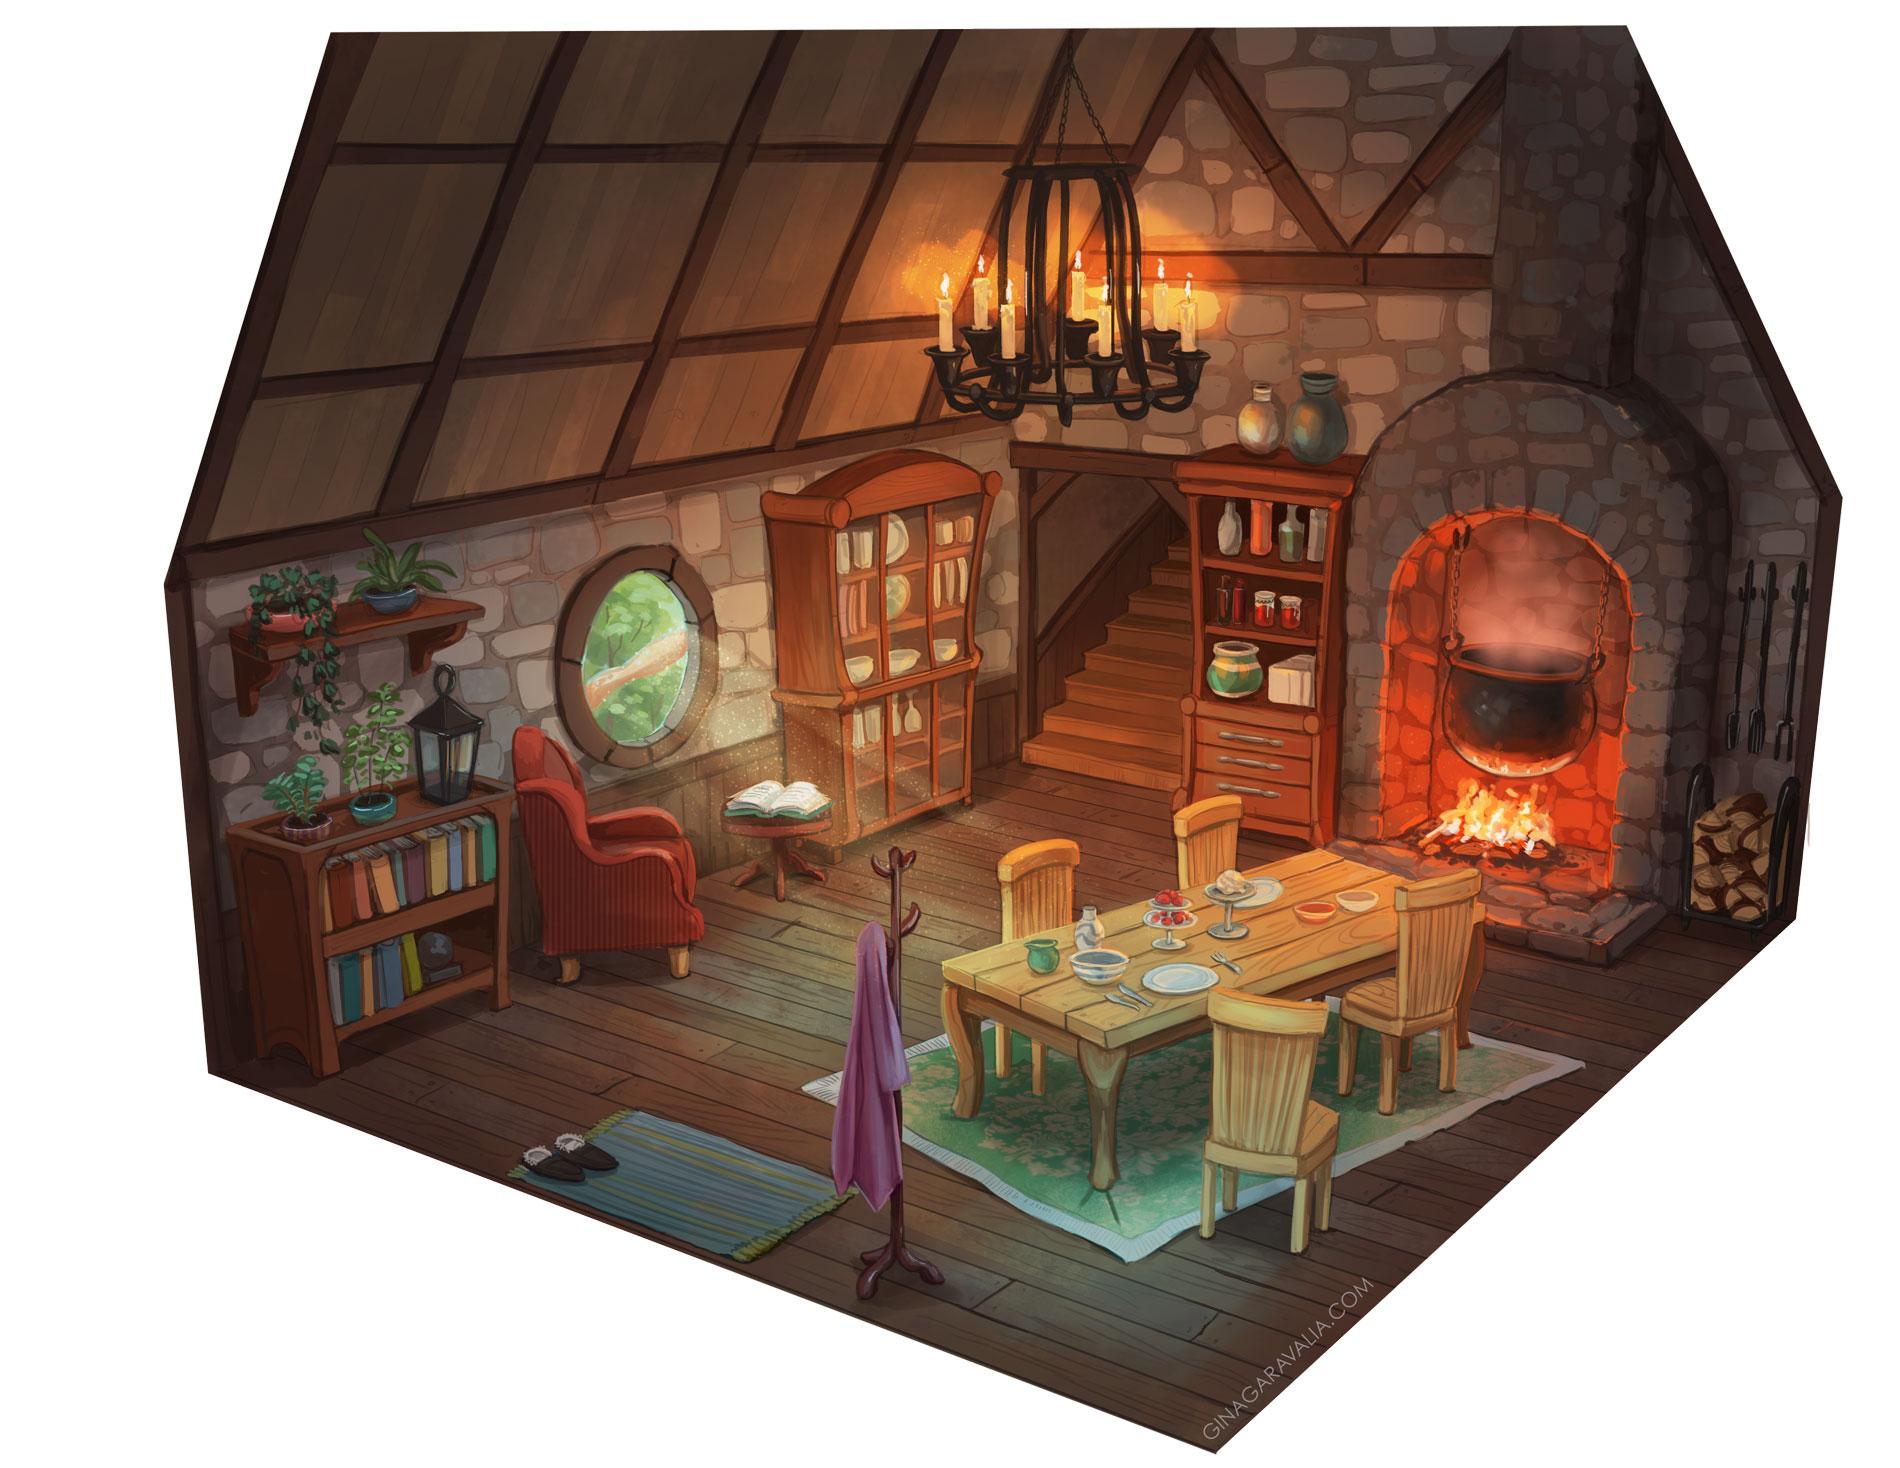 Candy-House-Interior---Gina-Garavalia.jpg